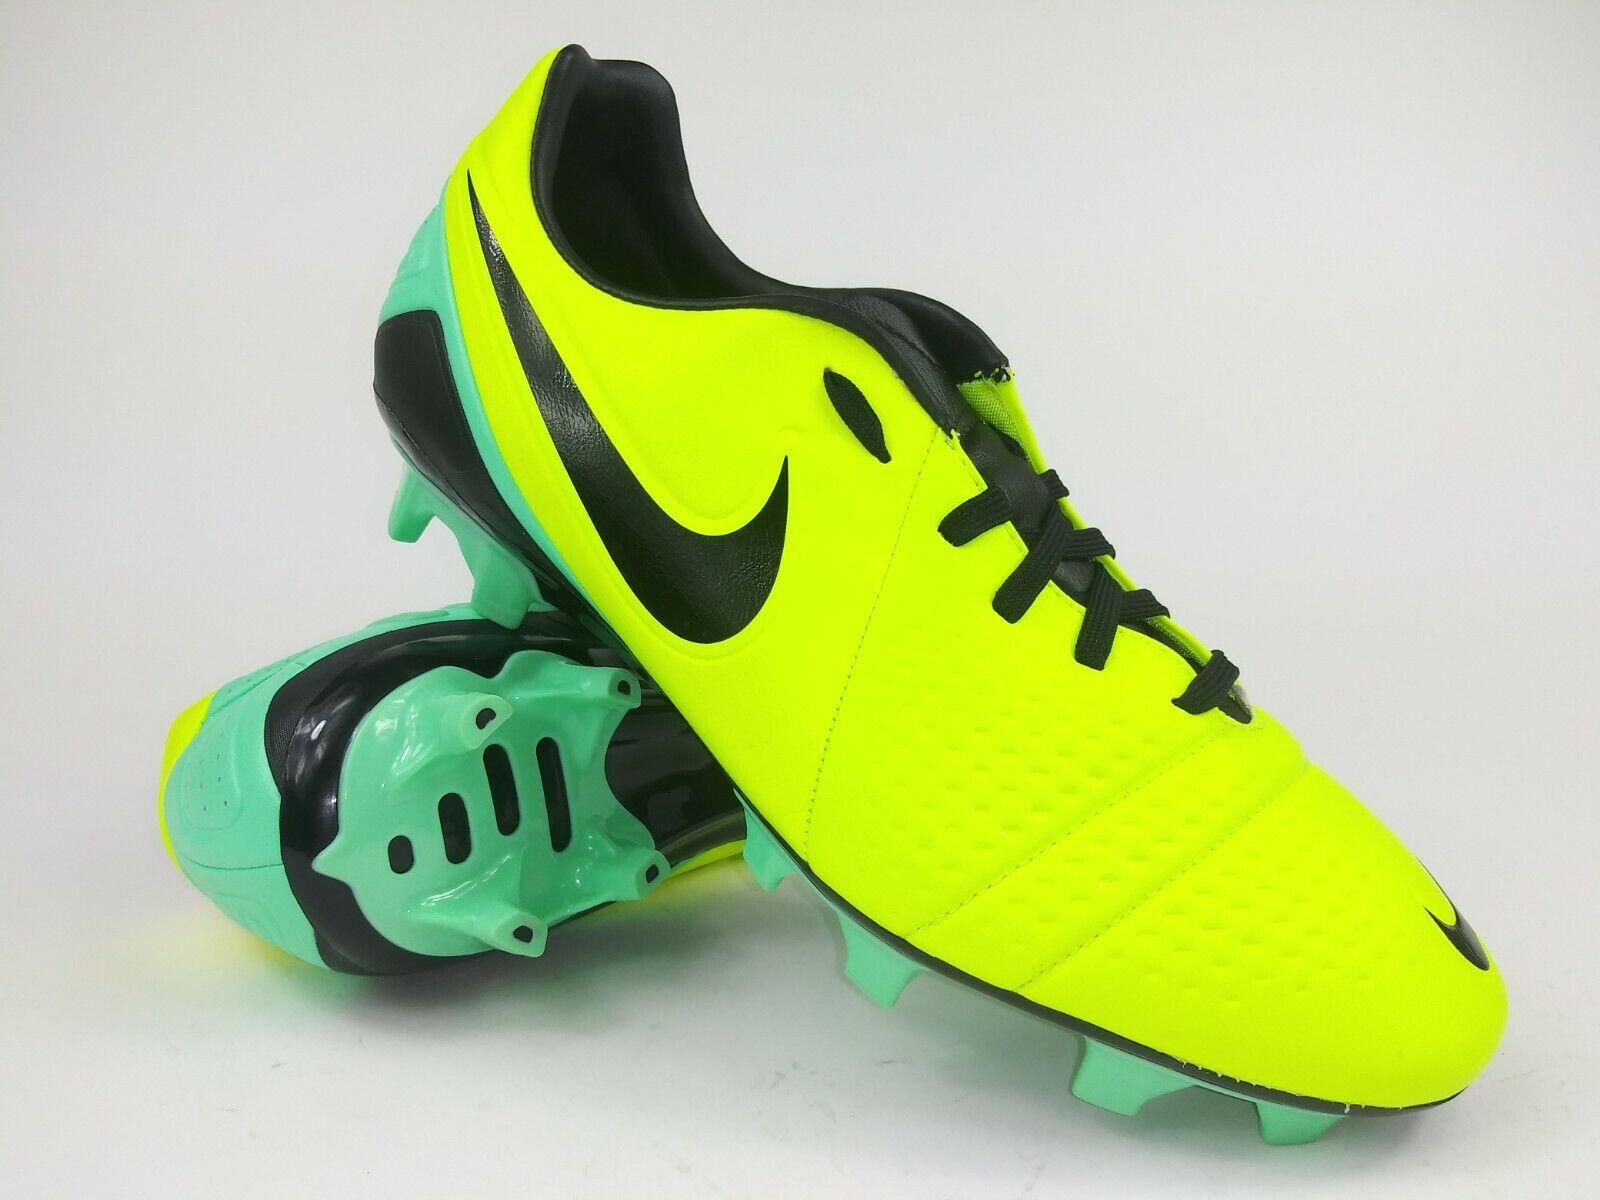 Nike Hombre Raro CTR360 Trequartista Lll Fg 525162 703 verde Amarillo Tacos